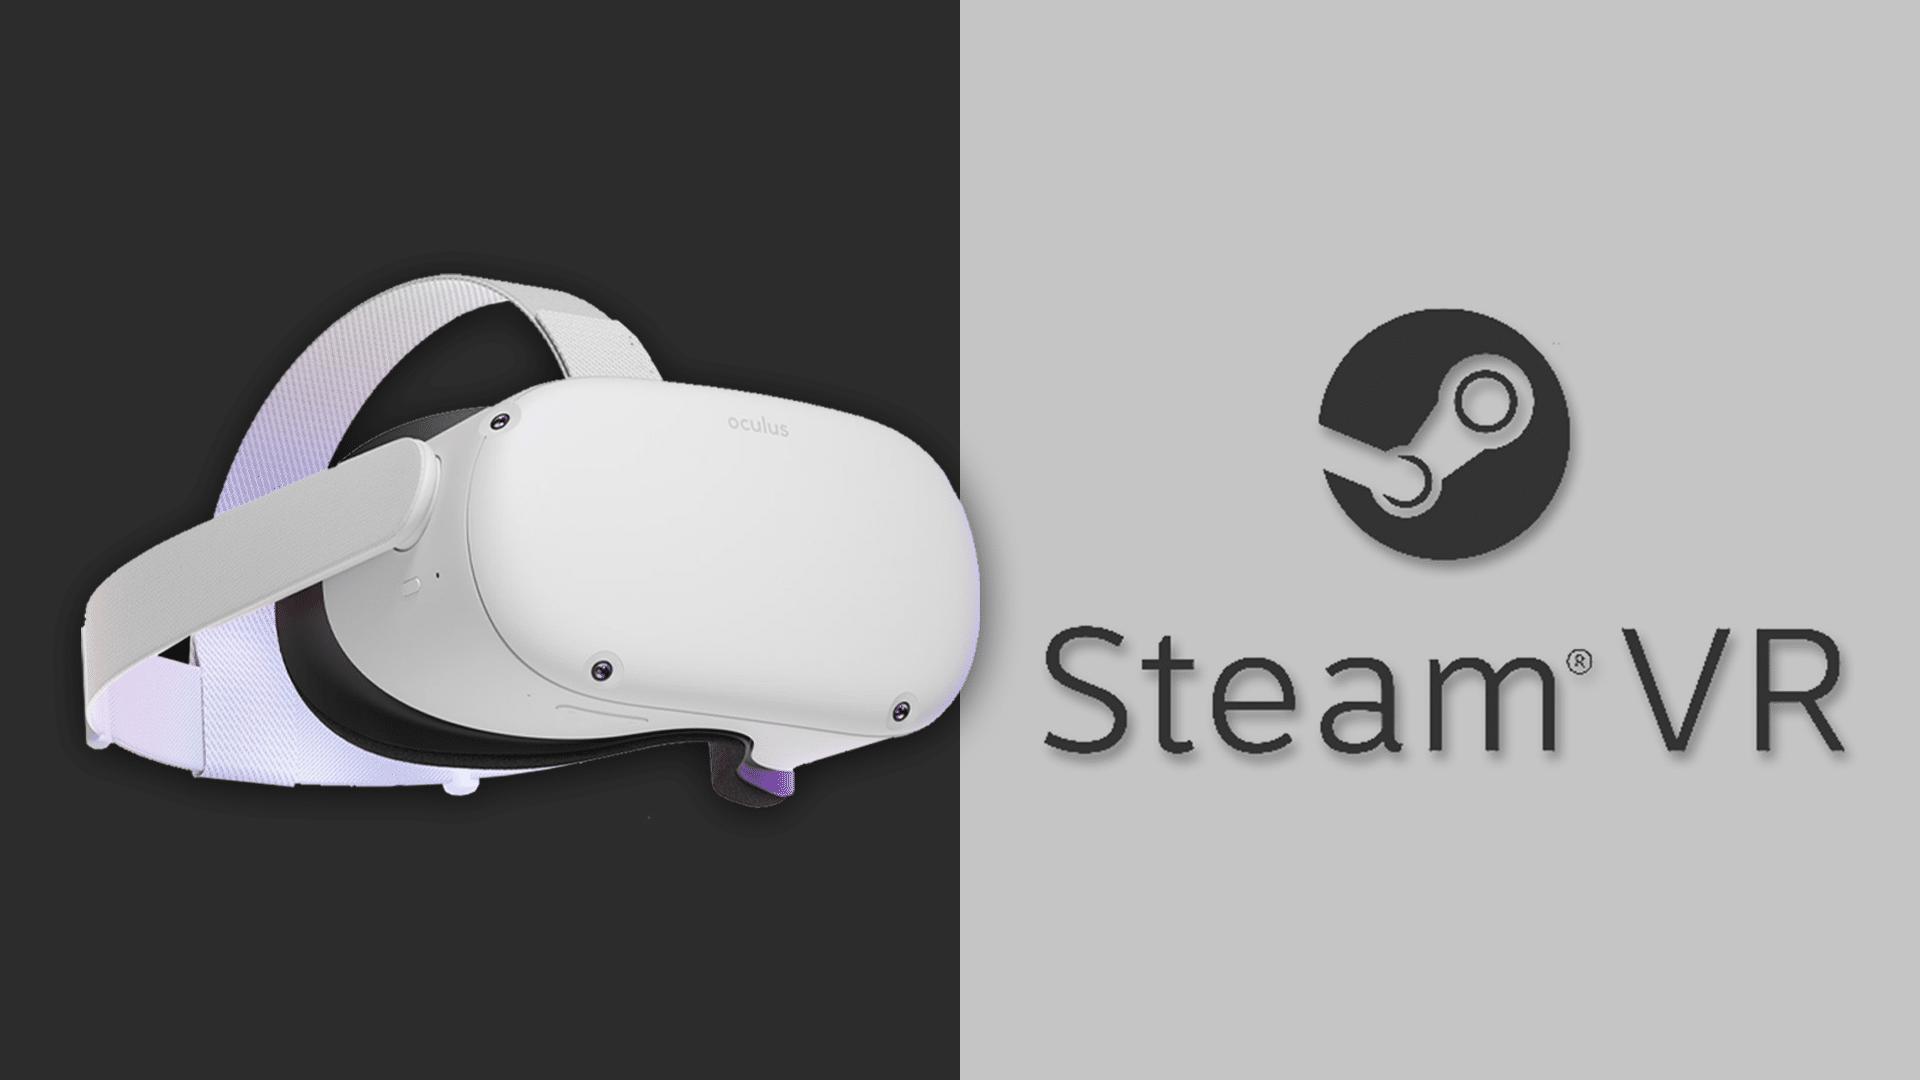 SteamVR 1.18:修复Oculus头显连接问题,中途断开后无需重启SteamVR